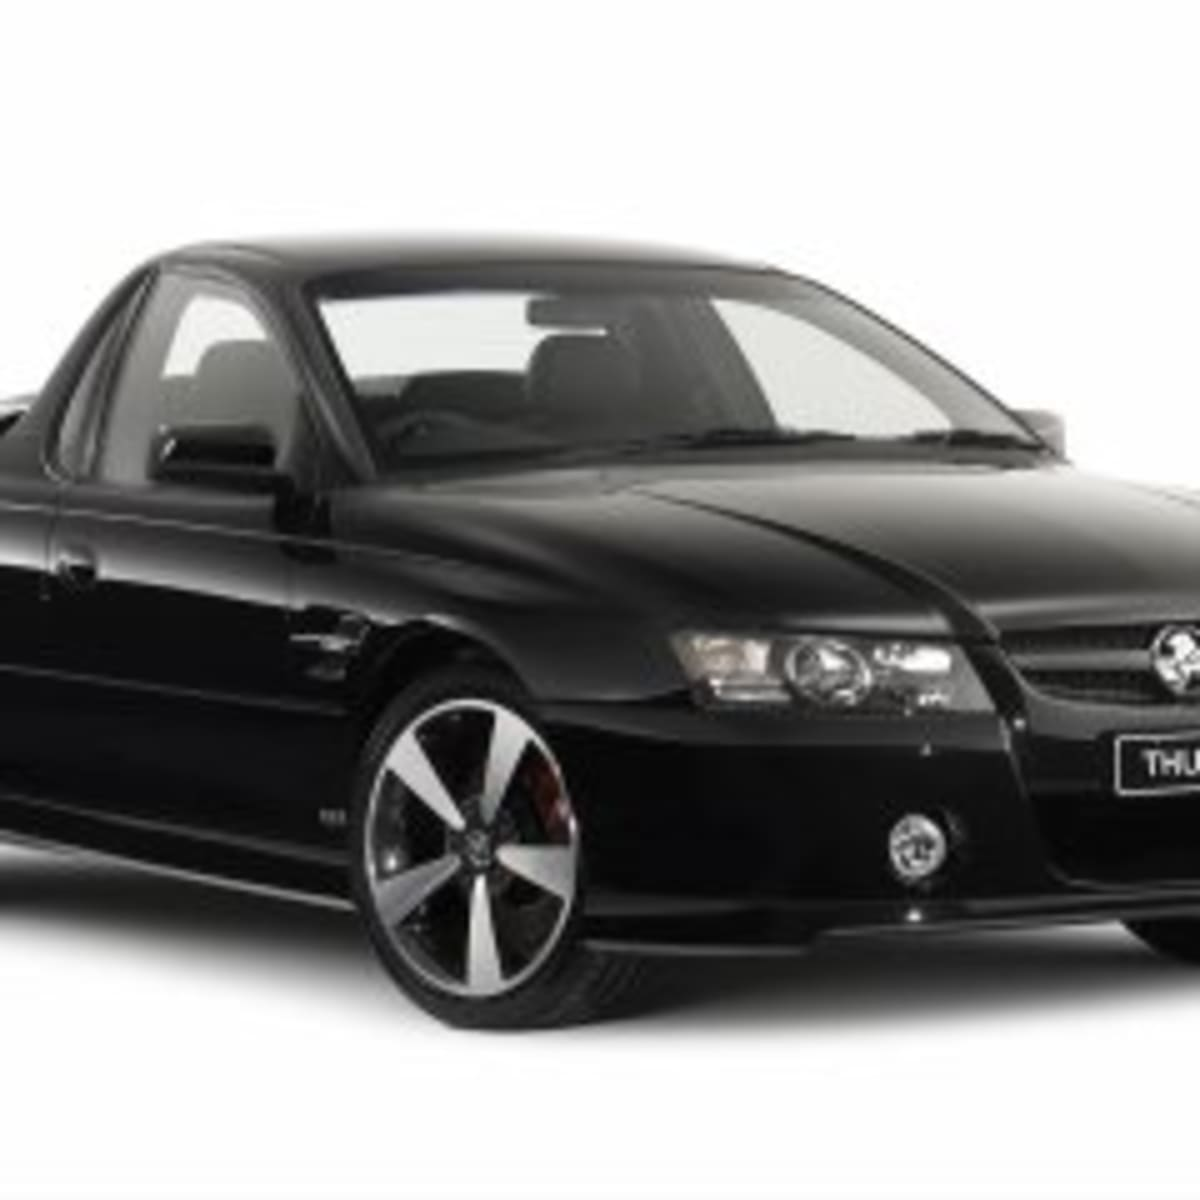 Holden SS Thunder Ute 2006 | CarAdvice